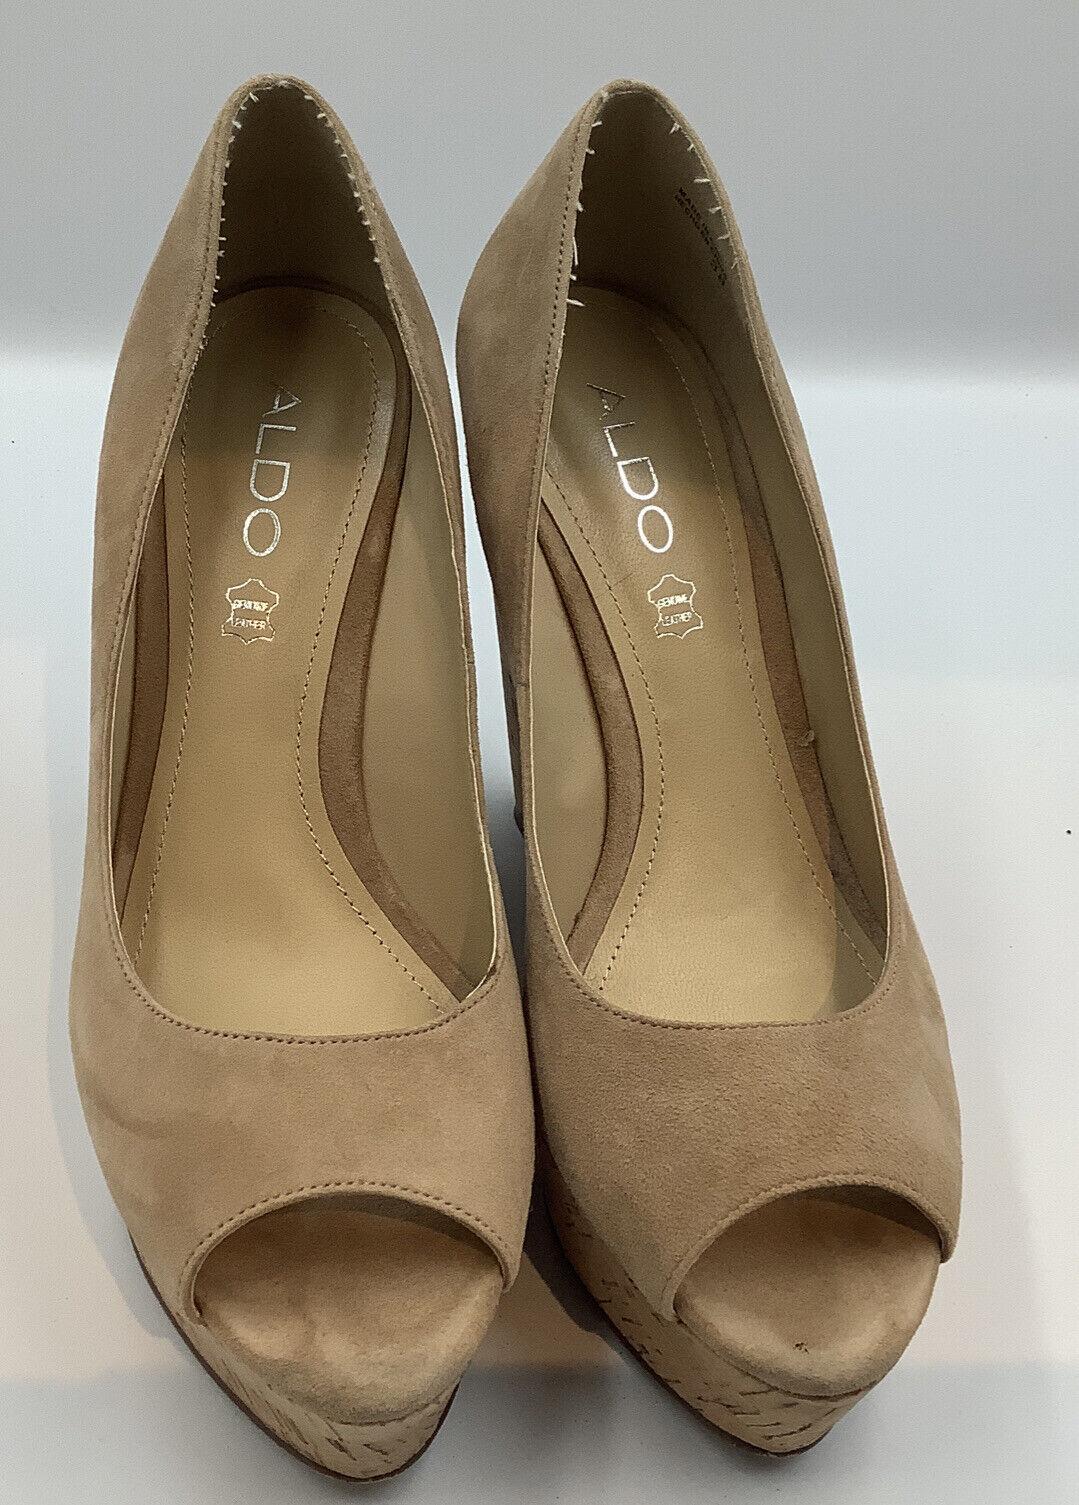 Aldo Leather Peep Toe Cork Wedges Size Eu 38 Uk 5